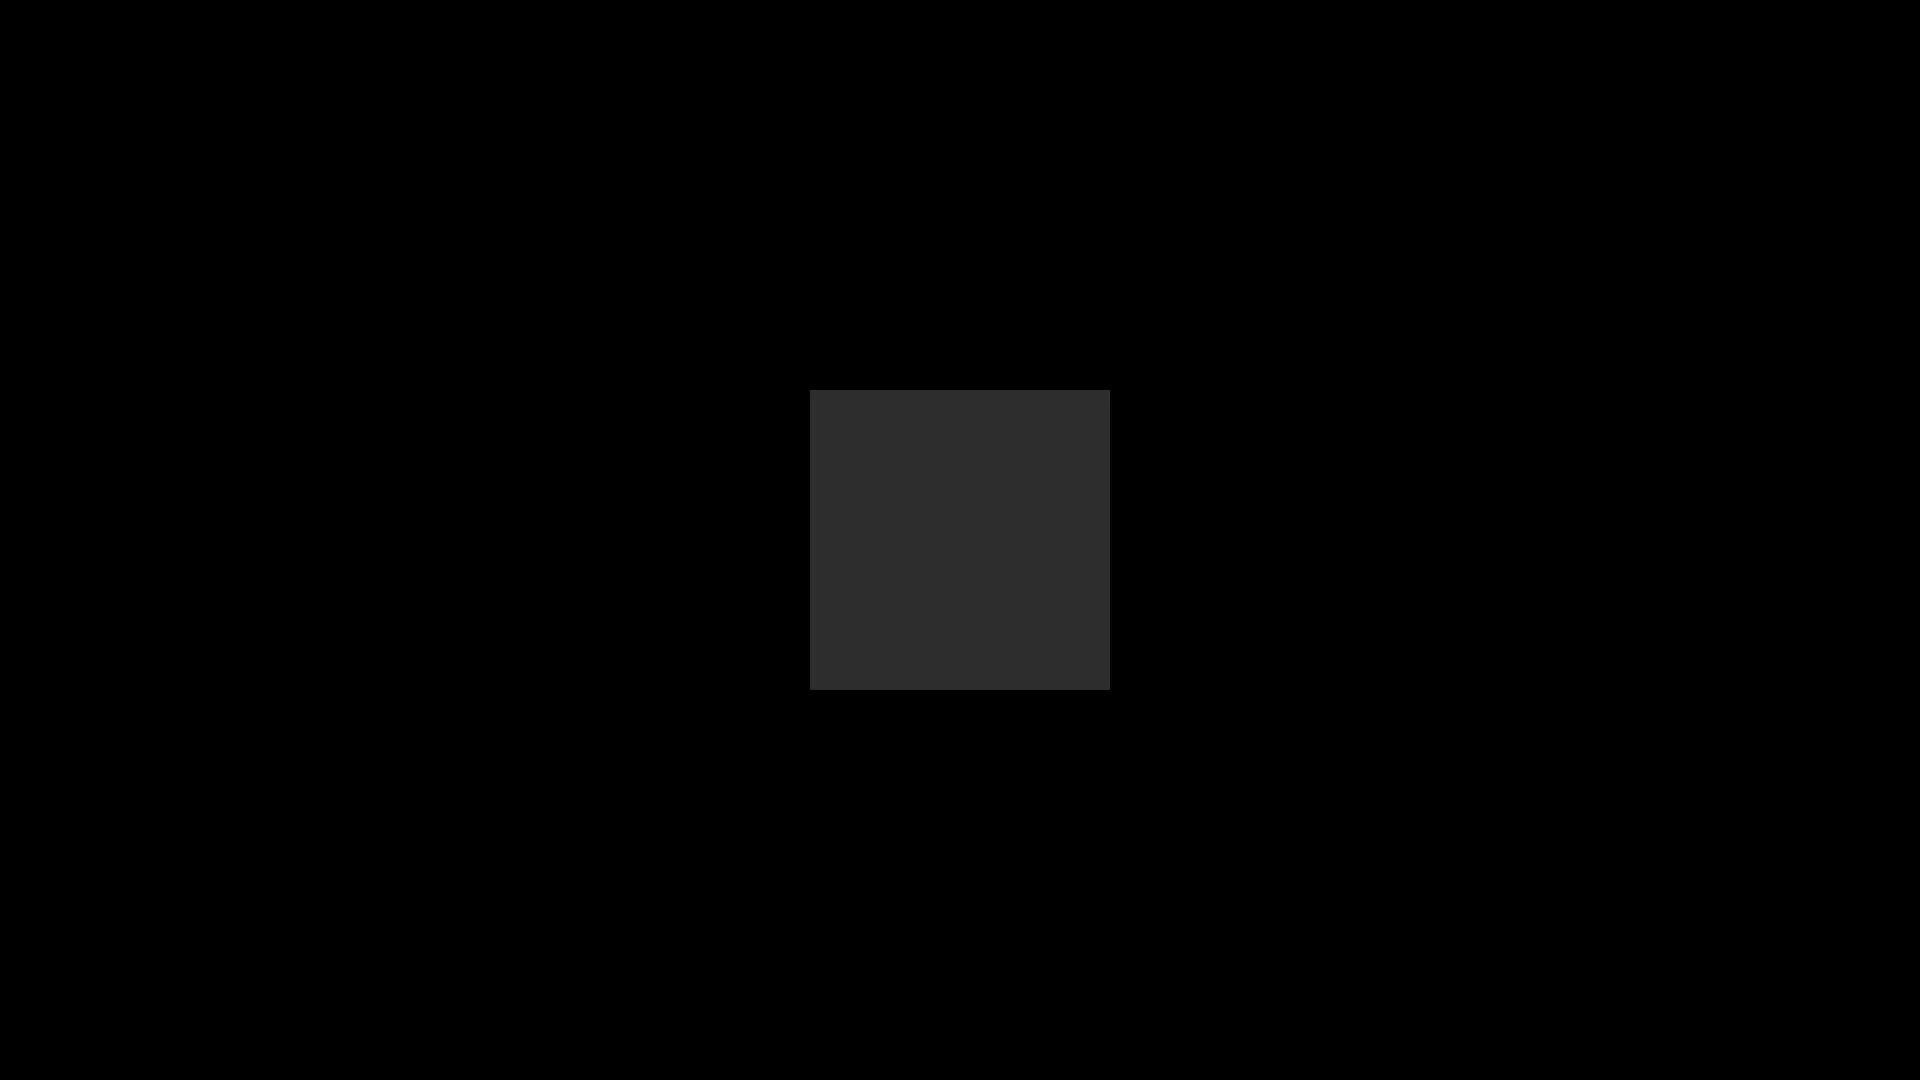 Animation GIFs